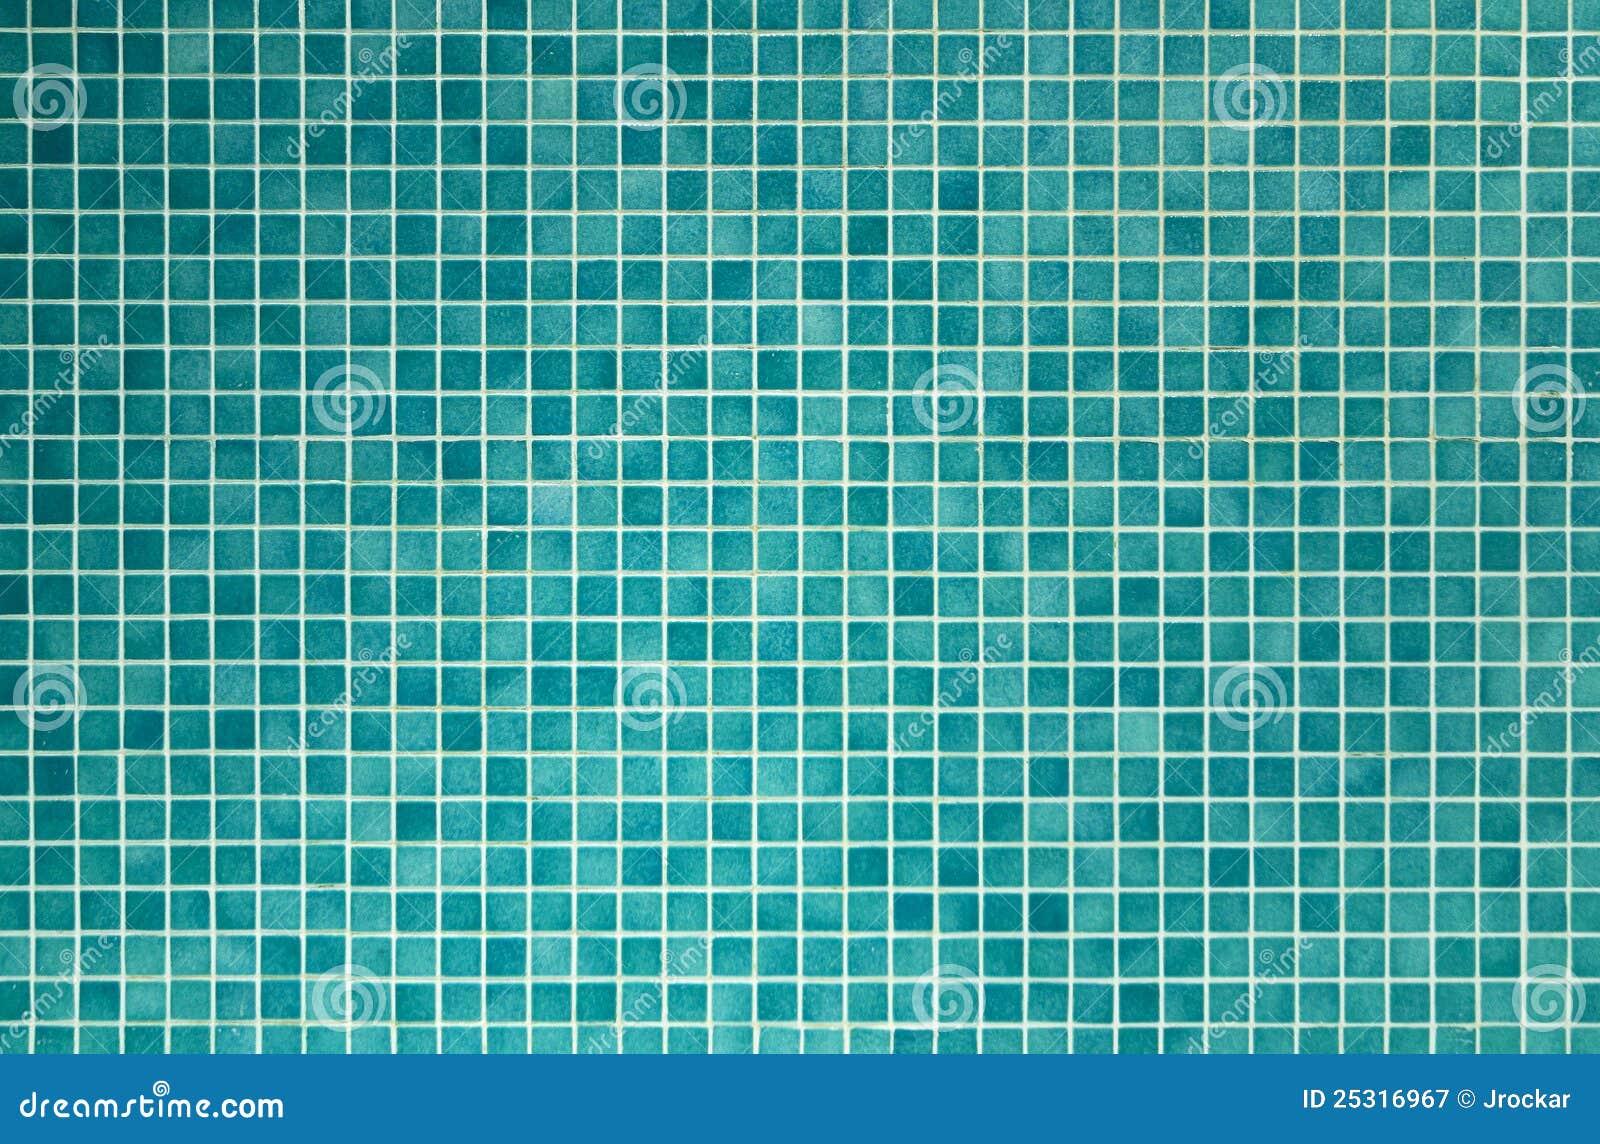 beautiful azulejos bao de mosaico verdes para el cuarto de bao y la cocina azulejos bao mosaico with azulejos para bao - Azulejos Bao